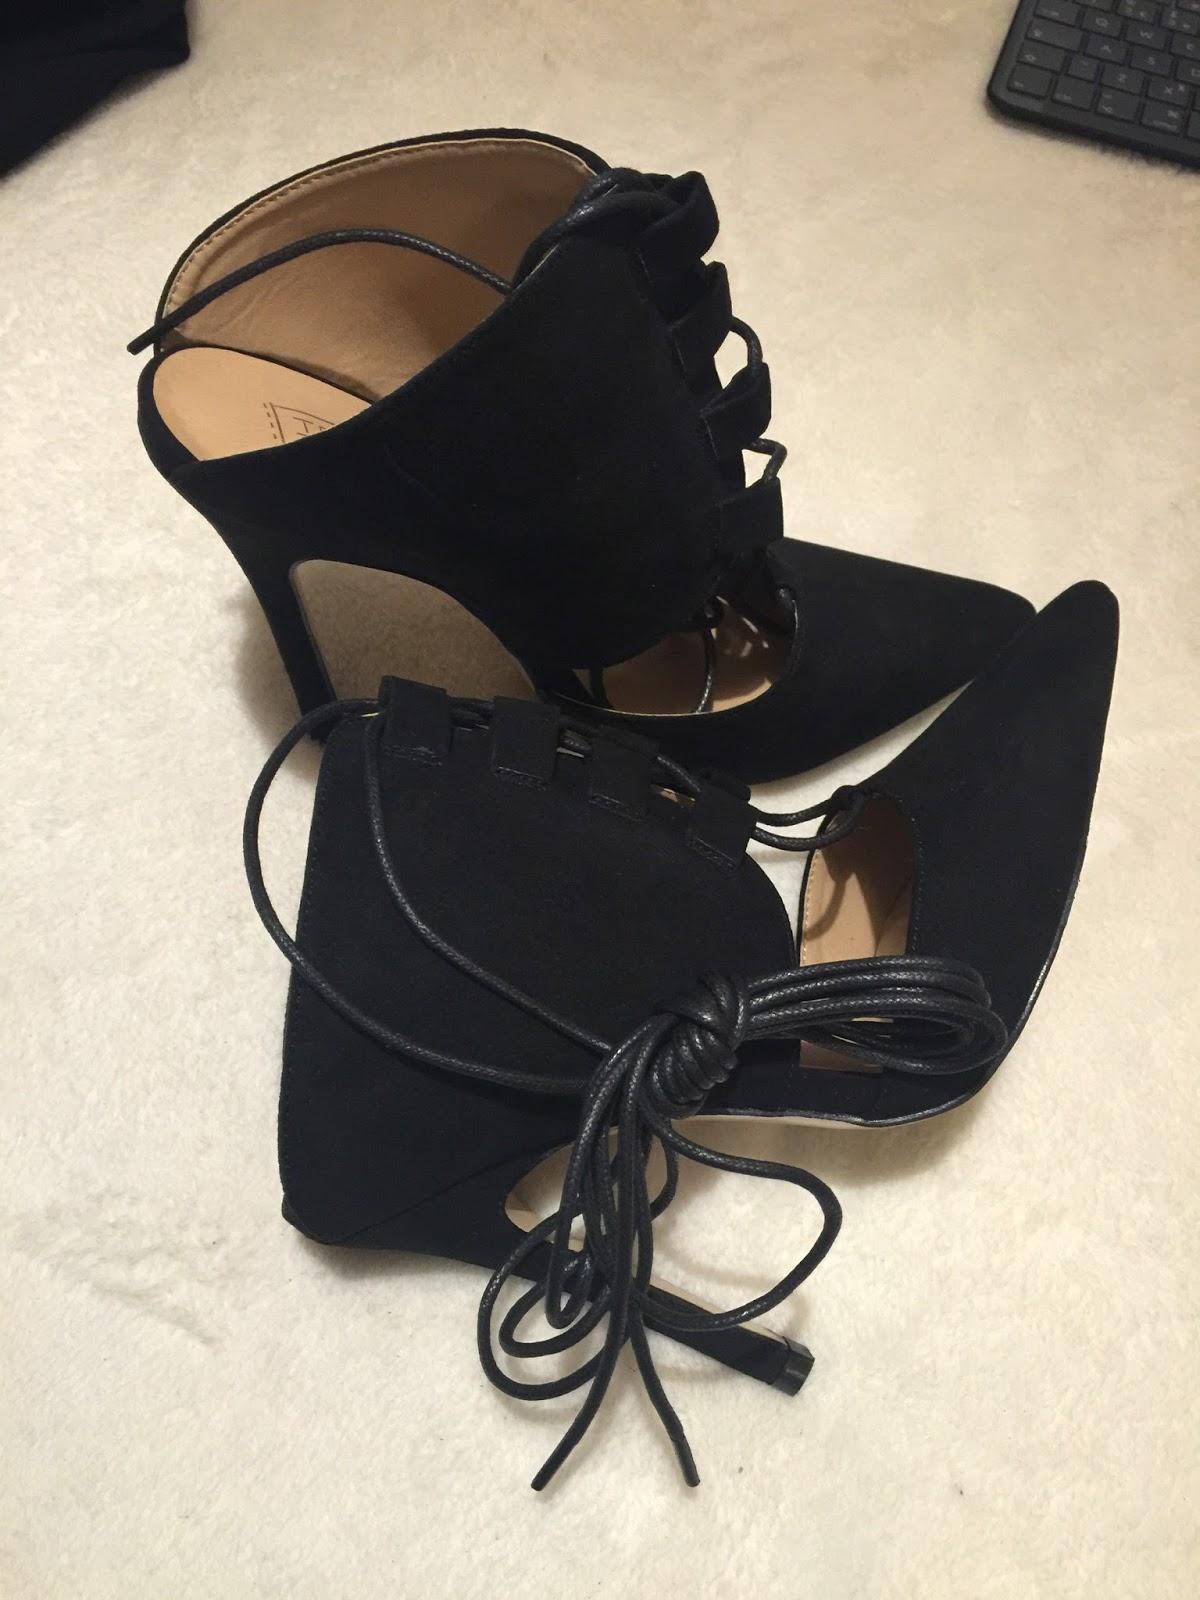 publicdesire Ivette High Heels In Black Faux Suede